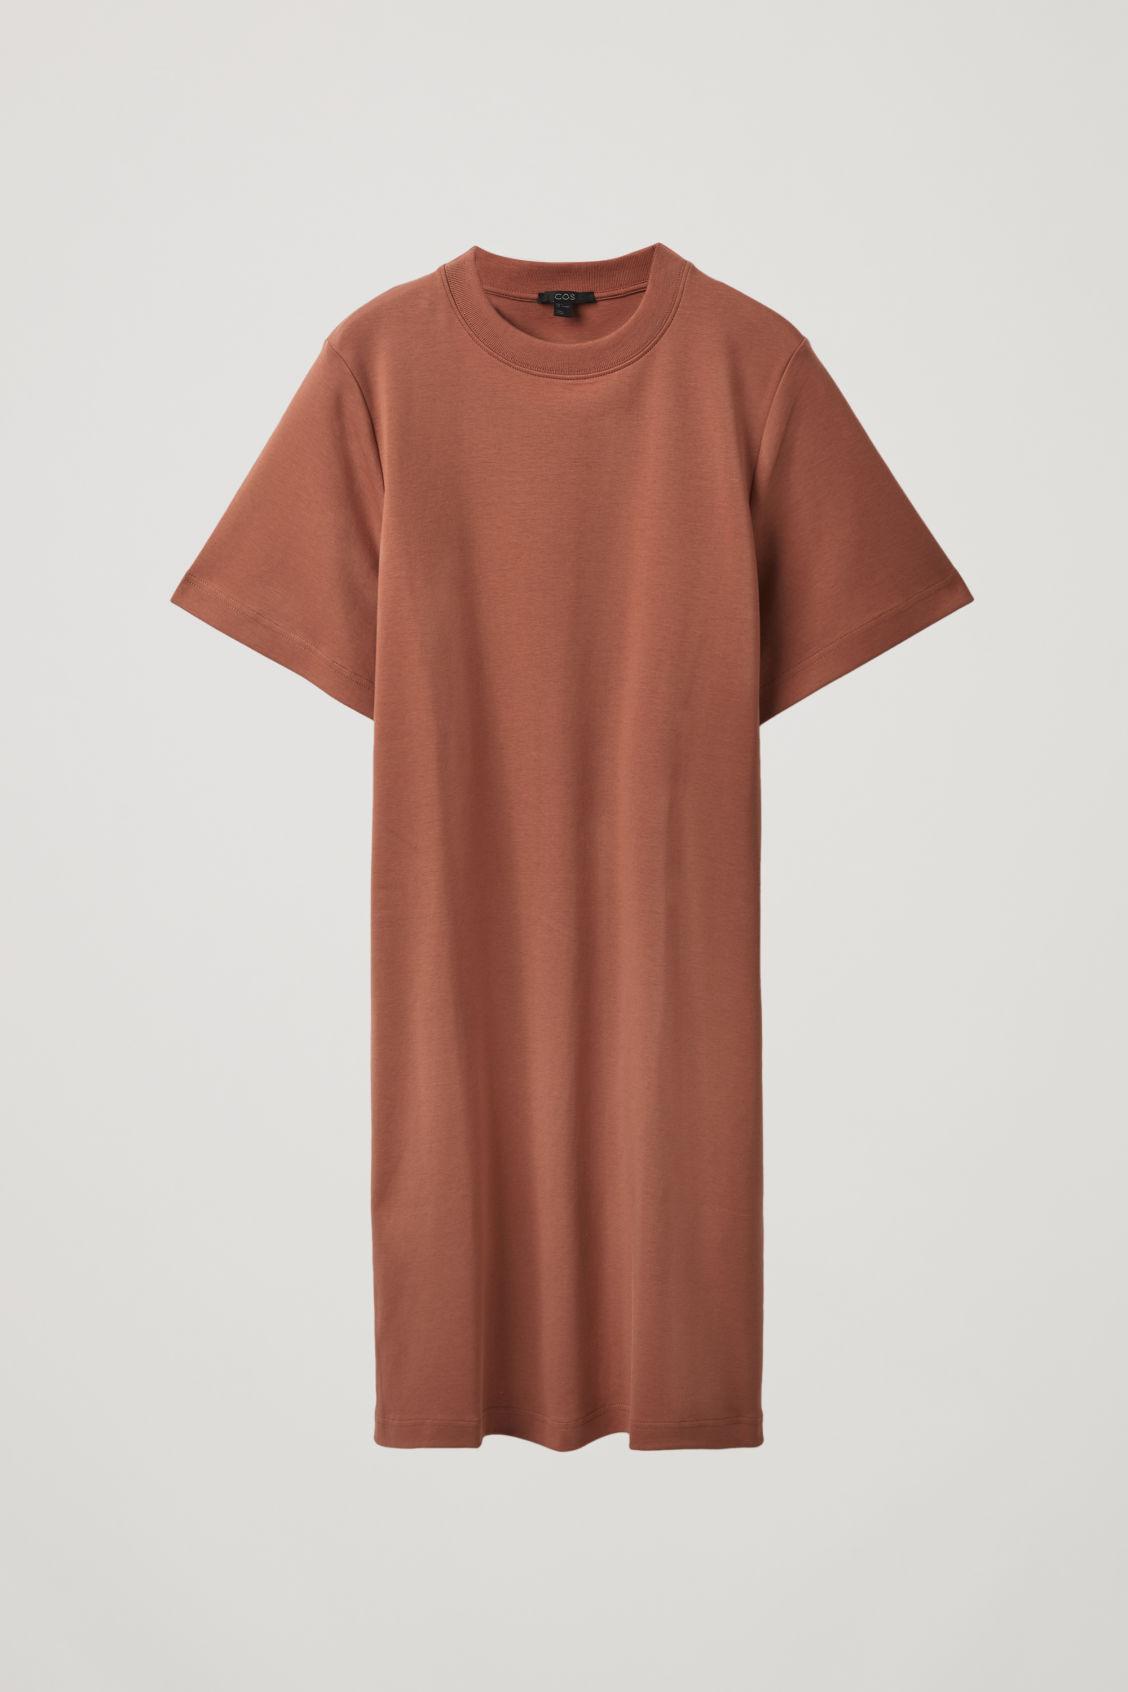 Cos T-shirt Dress In Brown